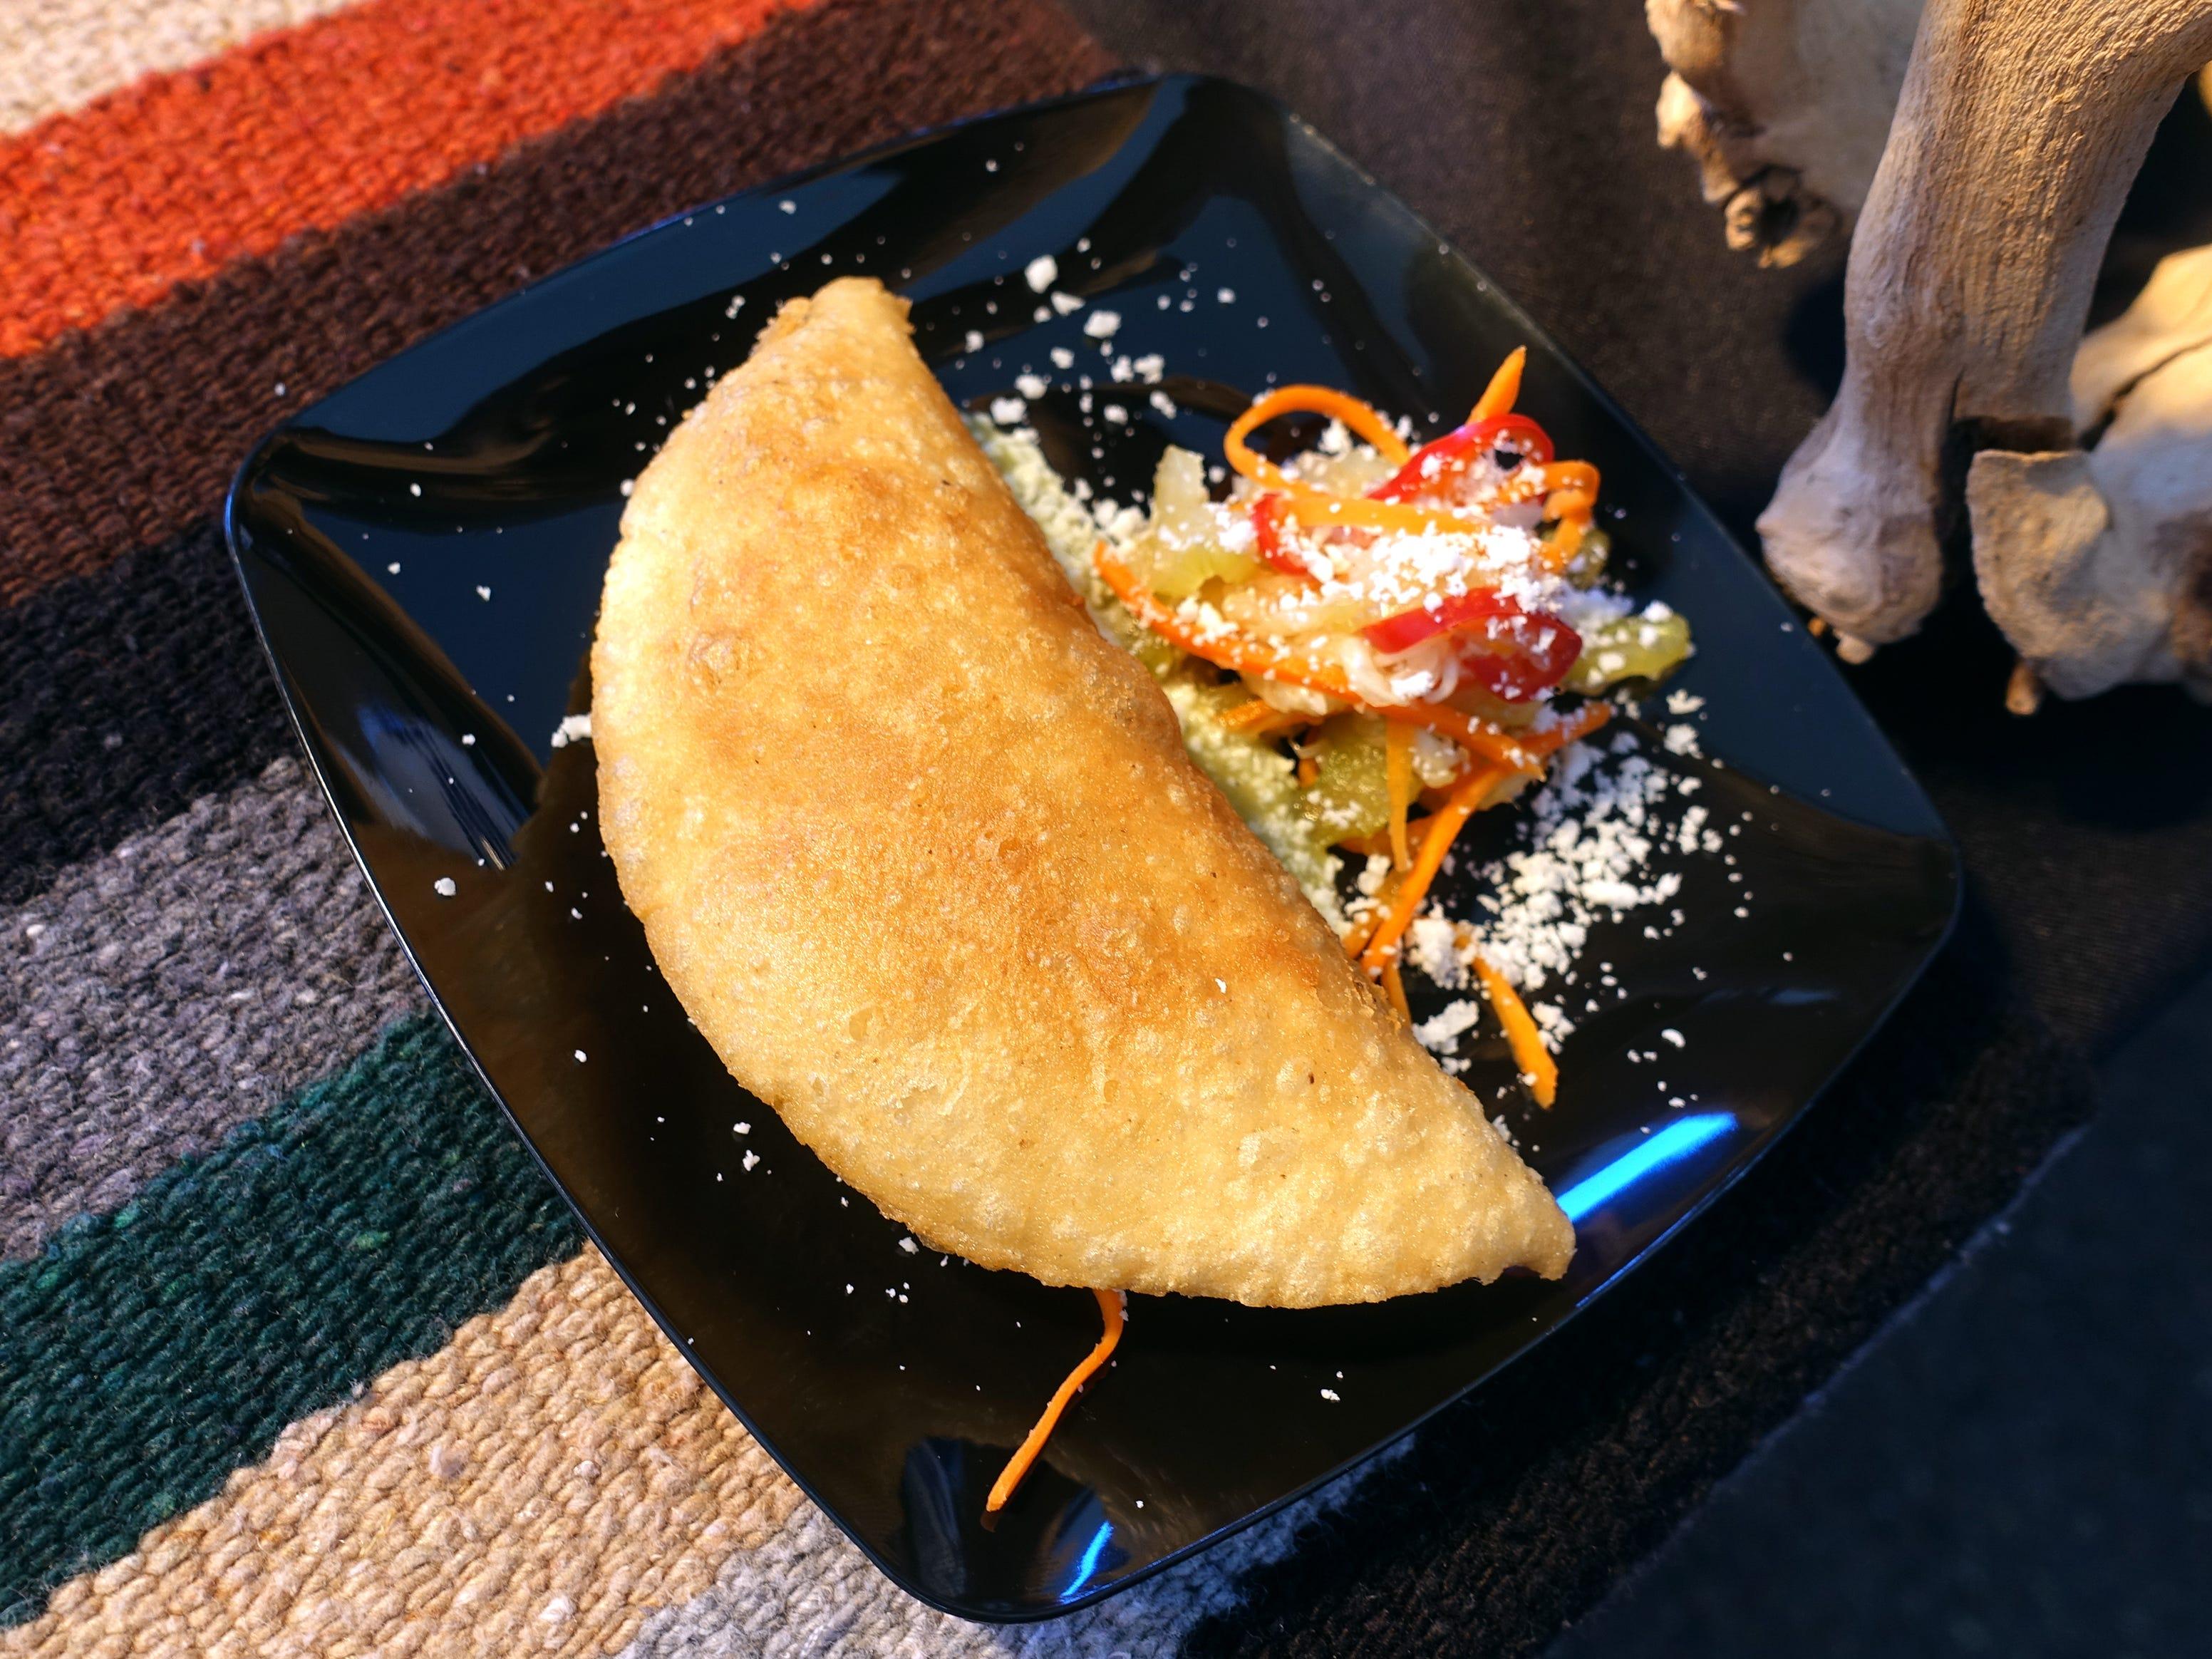 Chicken tinga chorizo quesadilla with crema fresca, salsa verde, escabeche and cotija cheese from La Hacienda at azcentral Wine & Food Experience 2018 at WestWorld of Scottsdale, Saturday, Nov. 3, 2018.